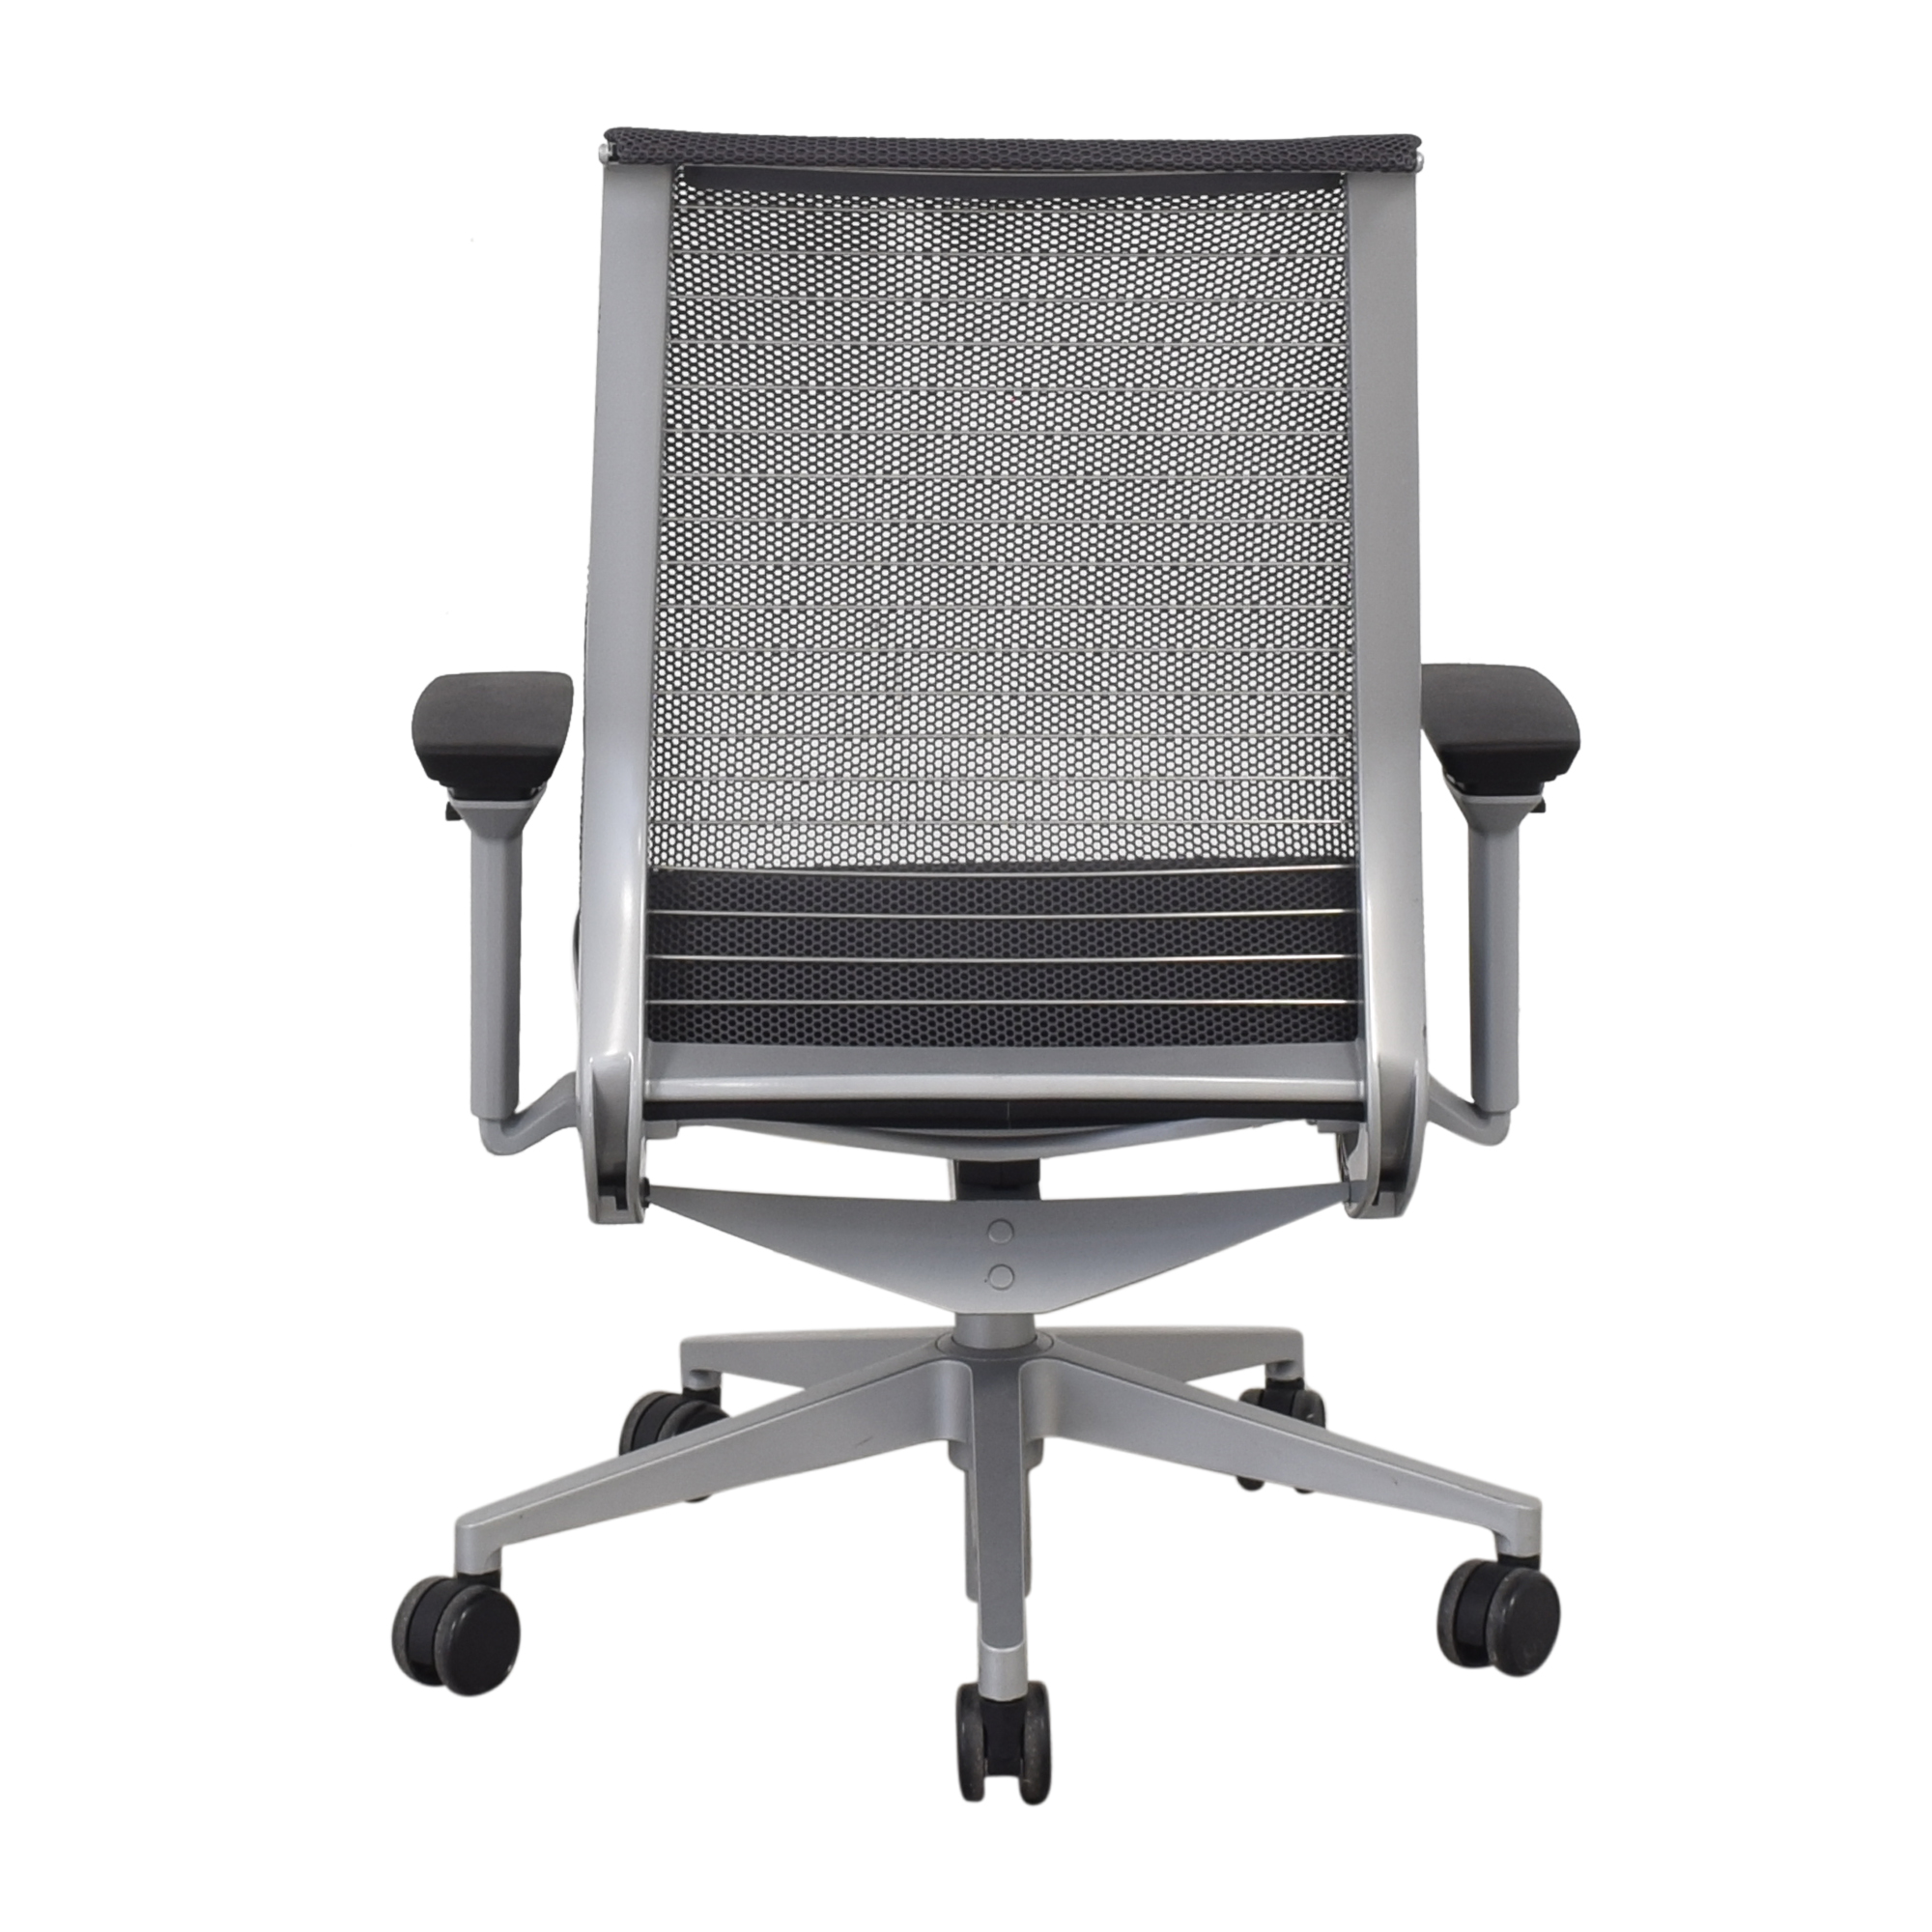 Steelcase Steelcase Cobi Swivel Chair pa